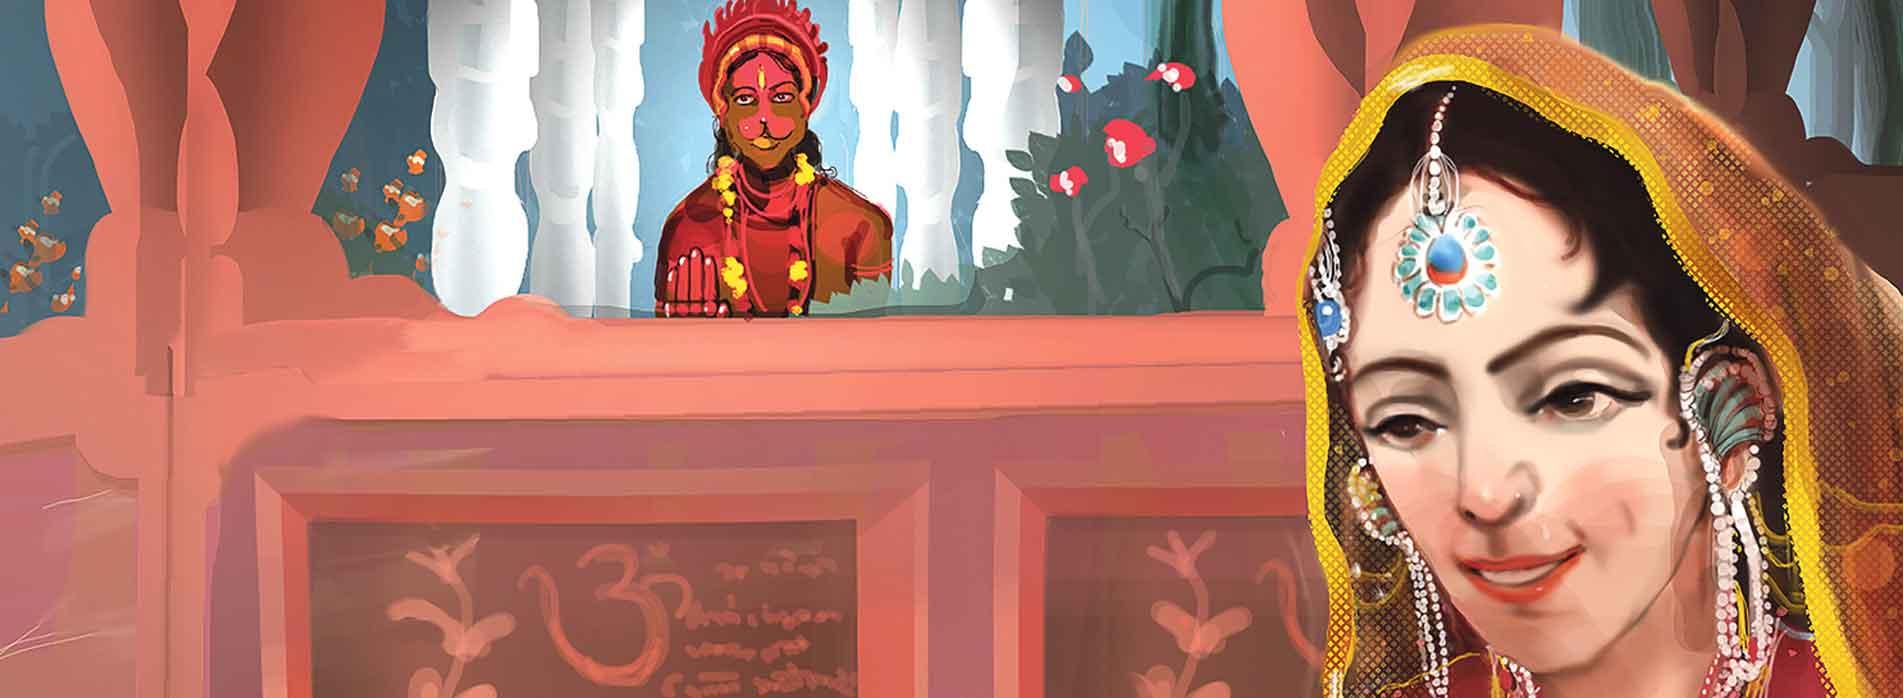 A Hanuman tale from Awadh